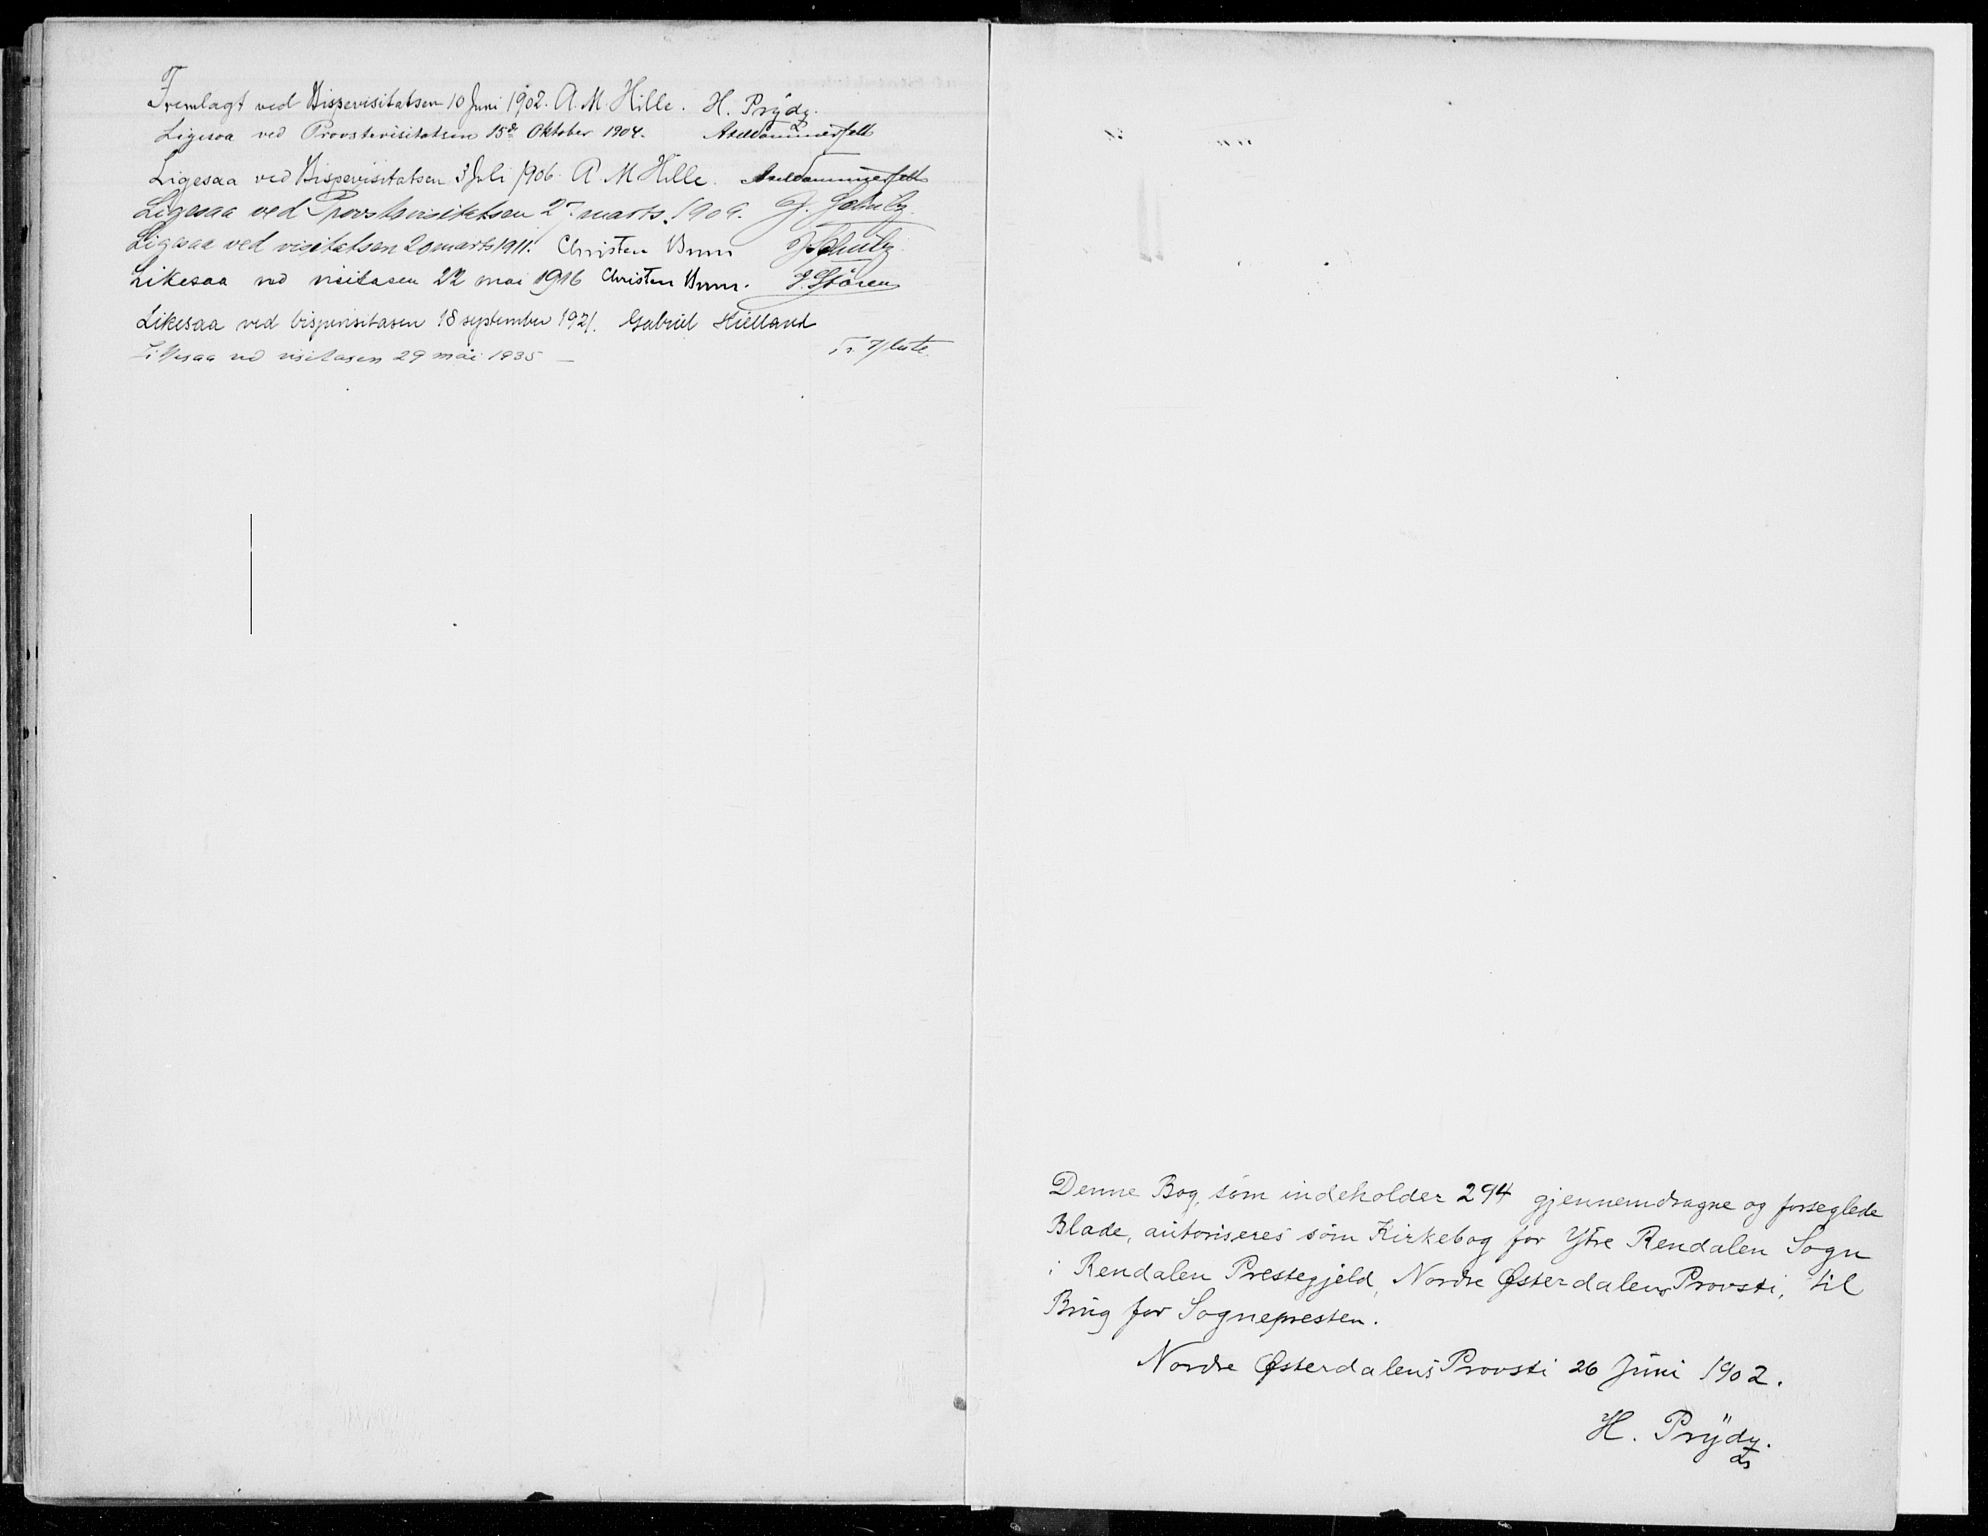 SAH, Rendalen prestekontor, H/Ha/Haa/L0011: Parish register (official) no. 11, 1901-1925